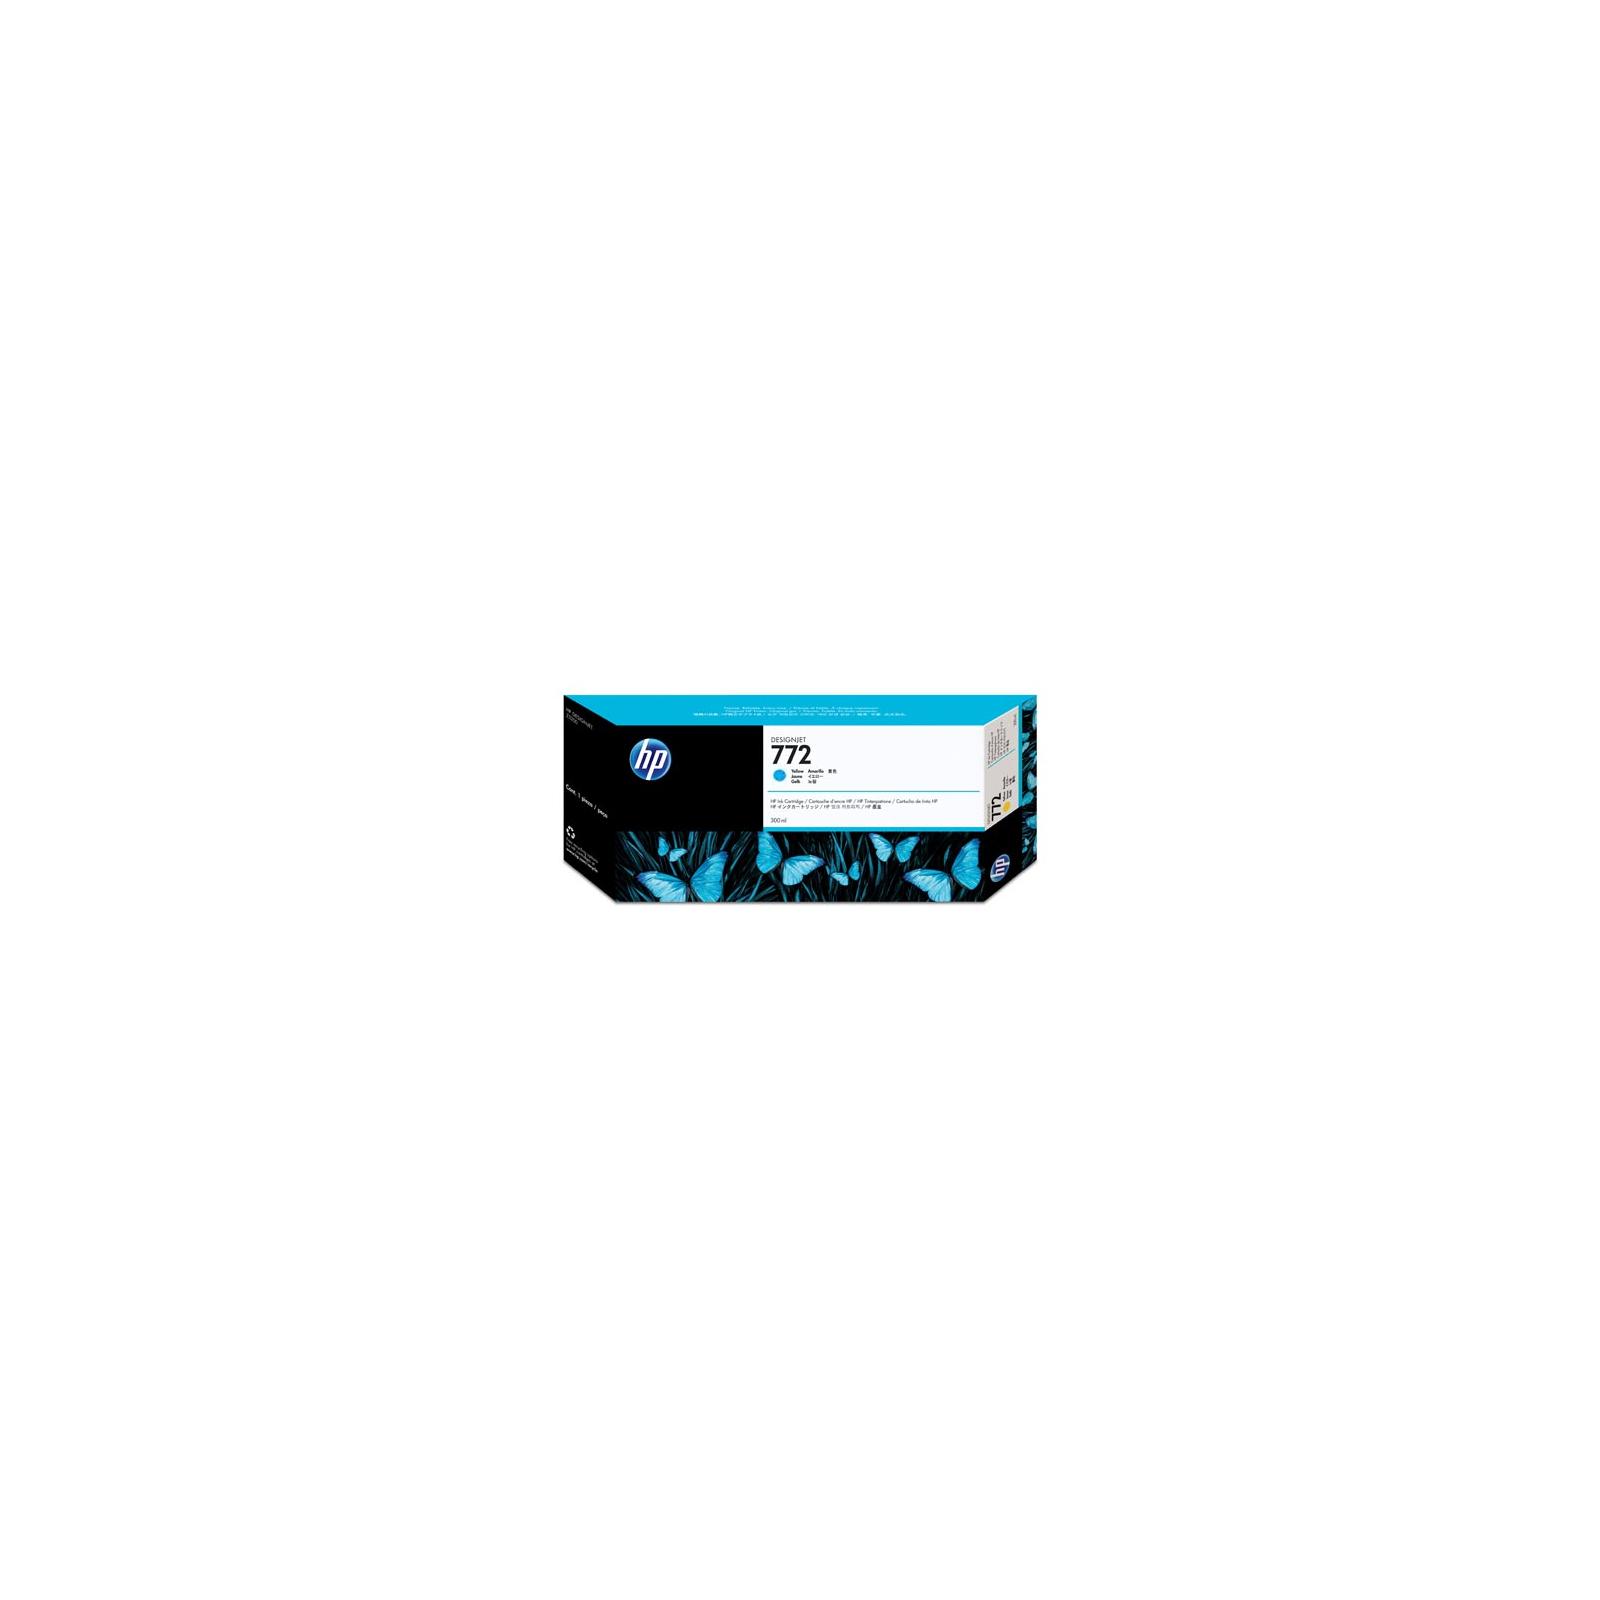 Картридж HP DJ No.772 Cyan Designjet Z5200 300 ml (CN636A)